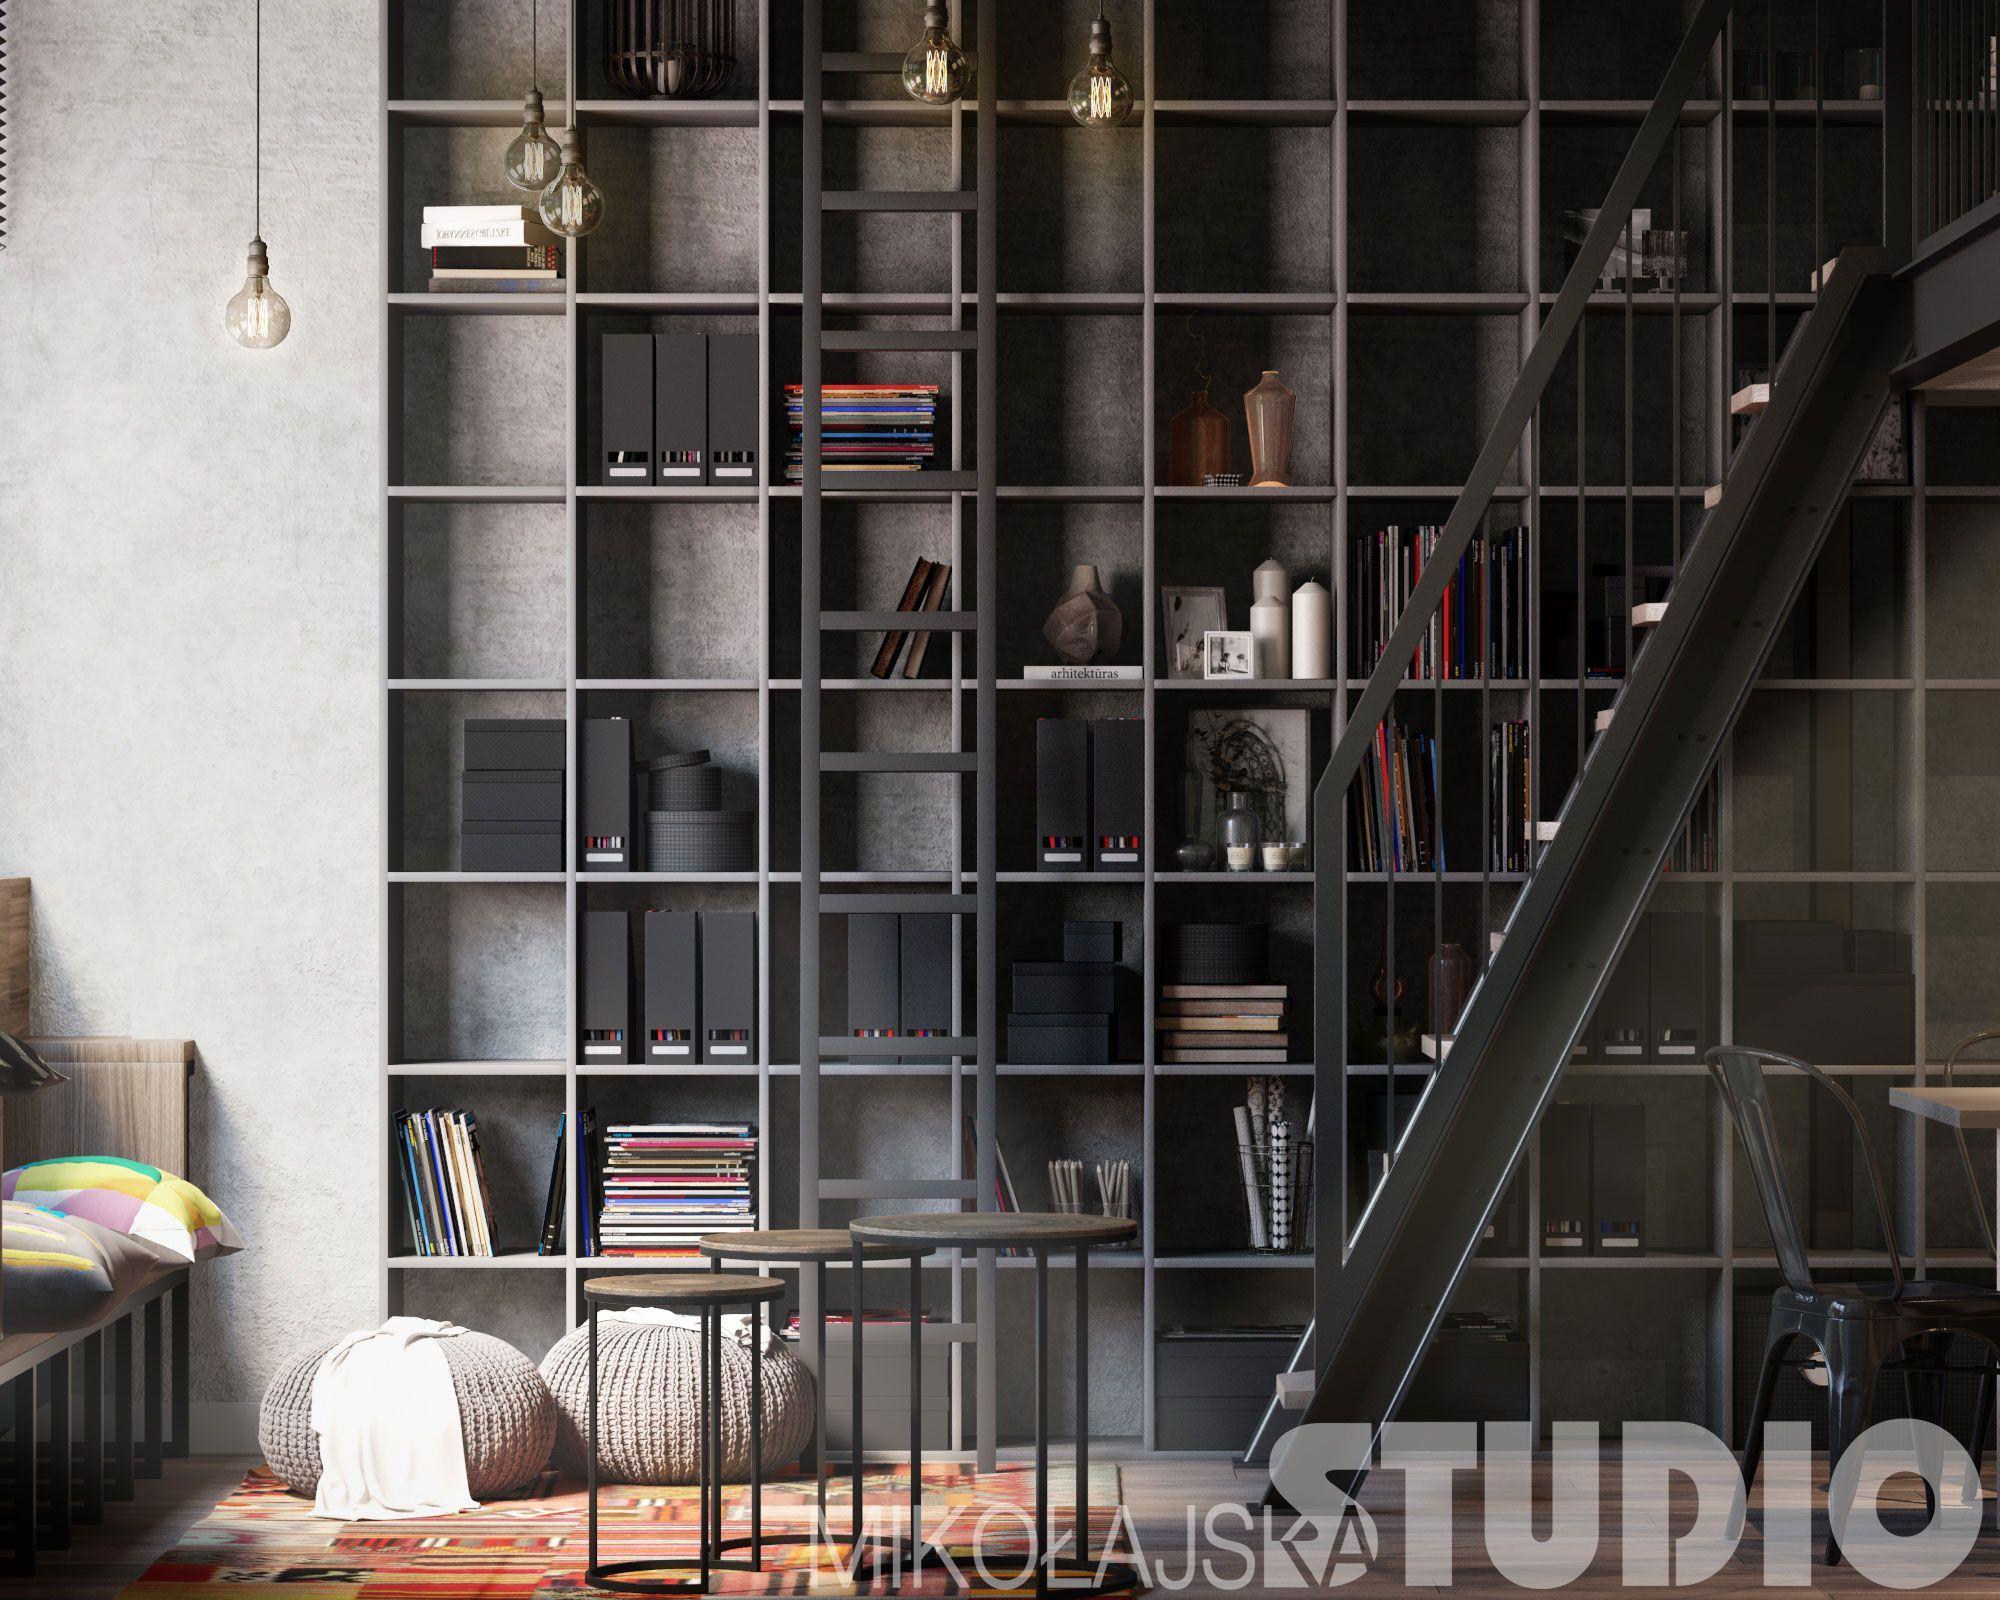 Lofty Lubelska Krakow Mikolajskastudio Krystyna Mikolajska Smart Home Design Shelving Unit